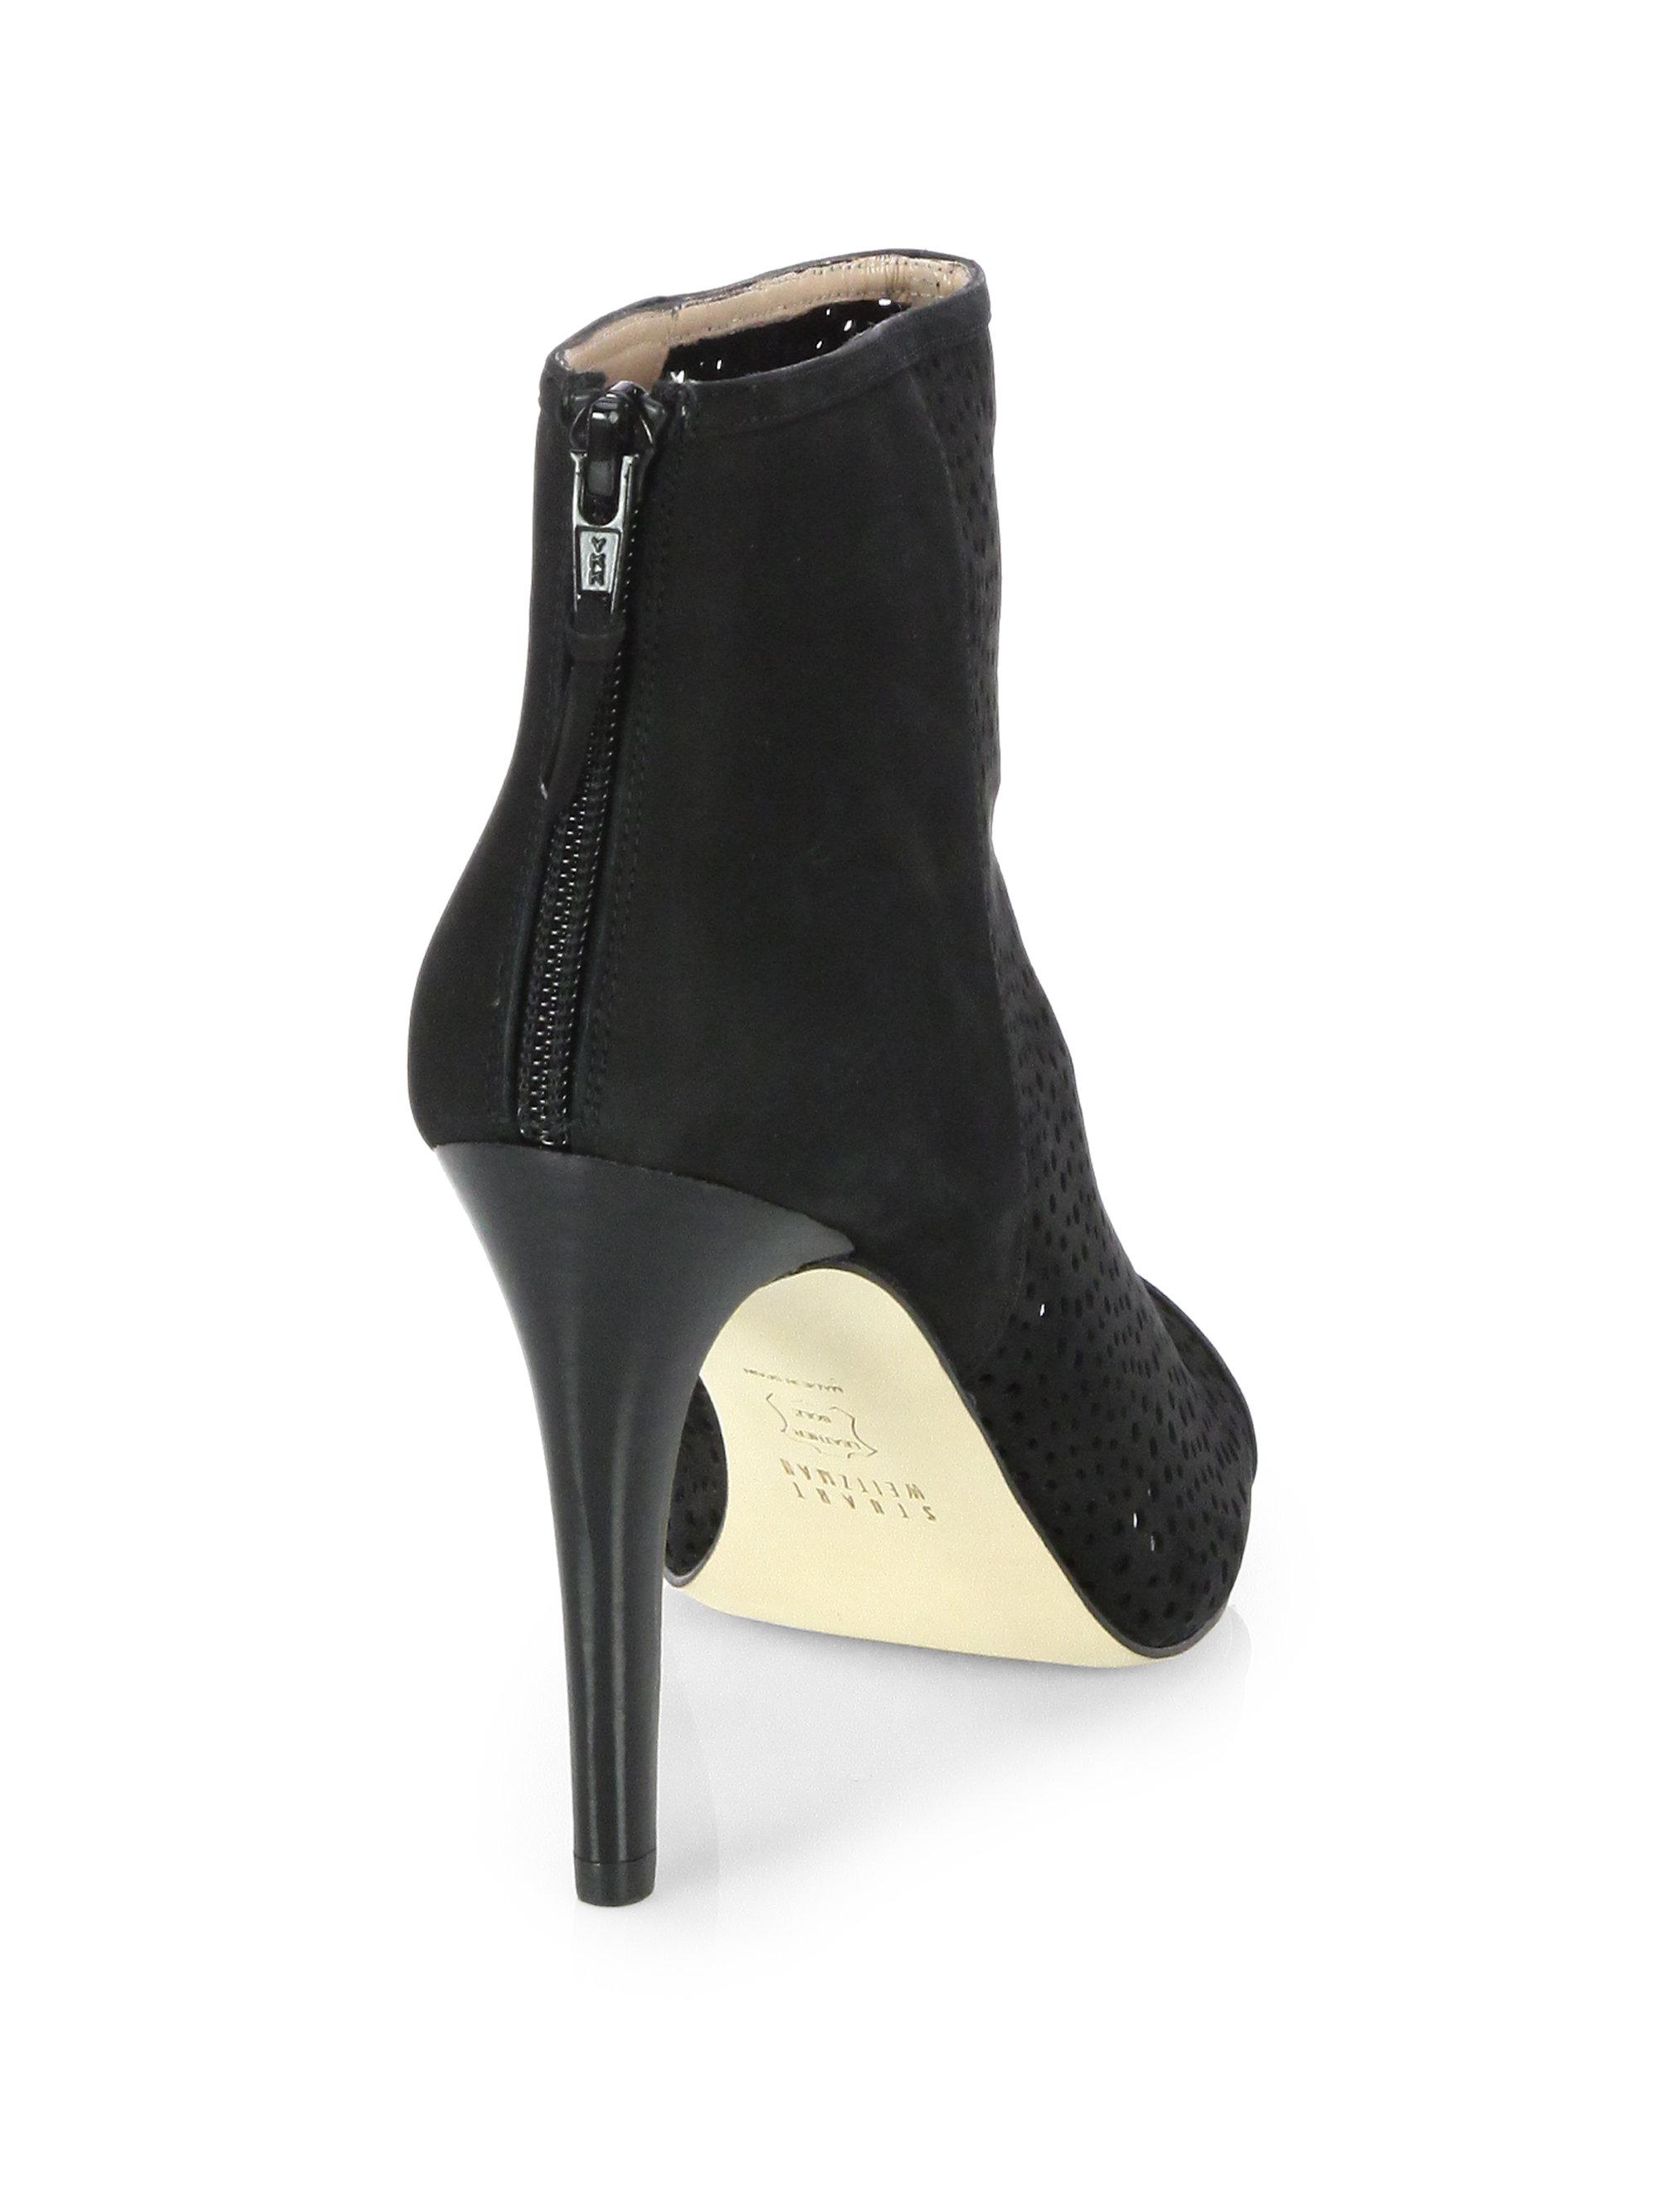 9b3983789eef Lyst - Stuart Weitzman Perforated Suede Peeptoe Ankle Boots in Black